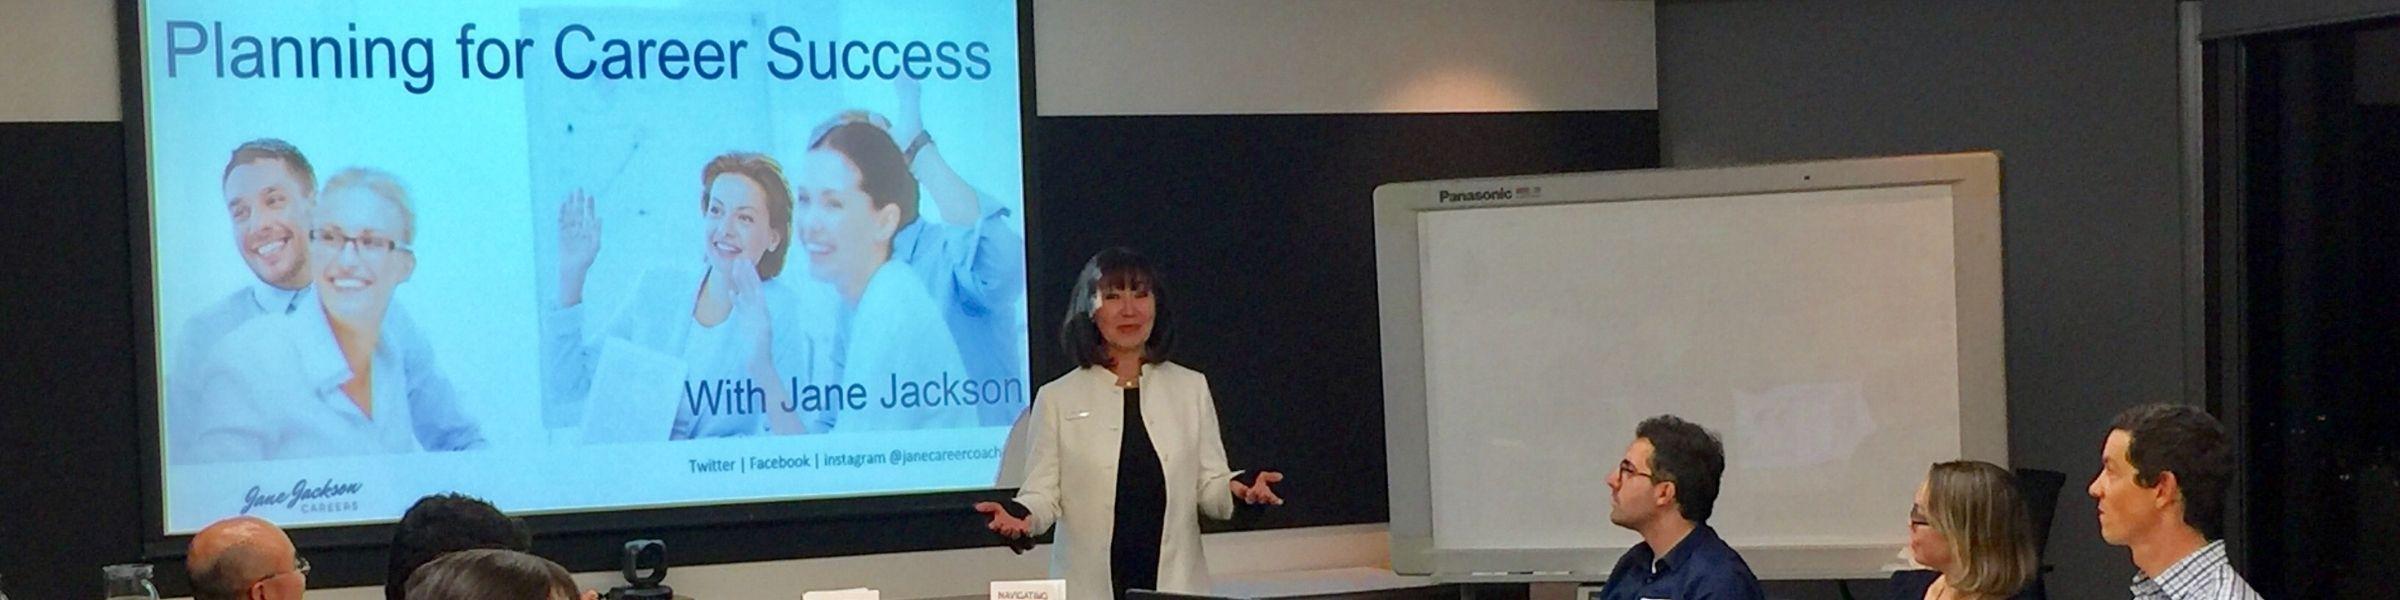 JANE JACKSON, group workshops, trainer, facilitator, career coach